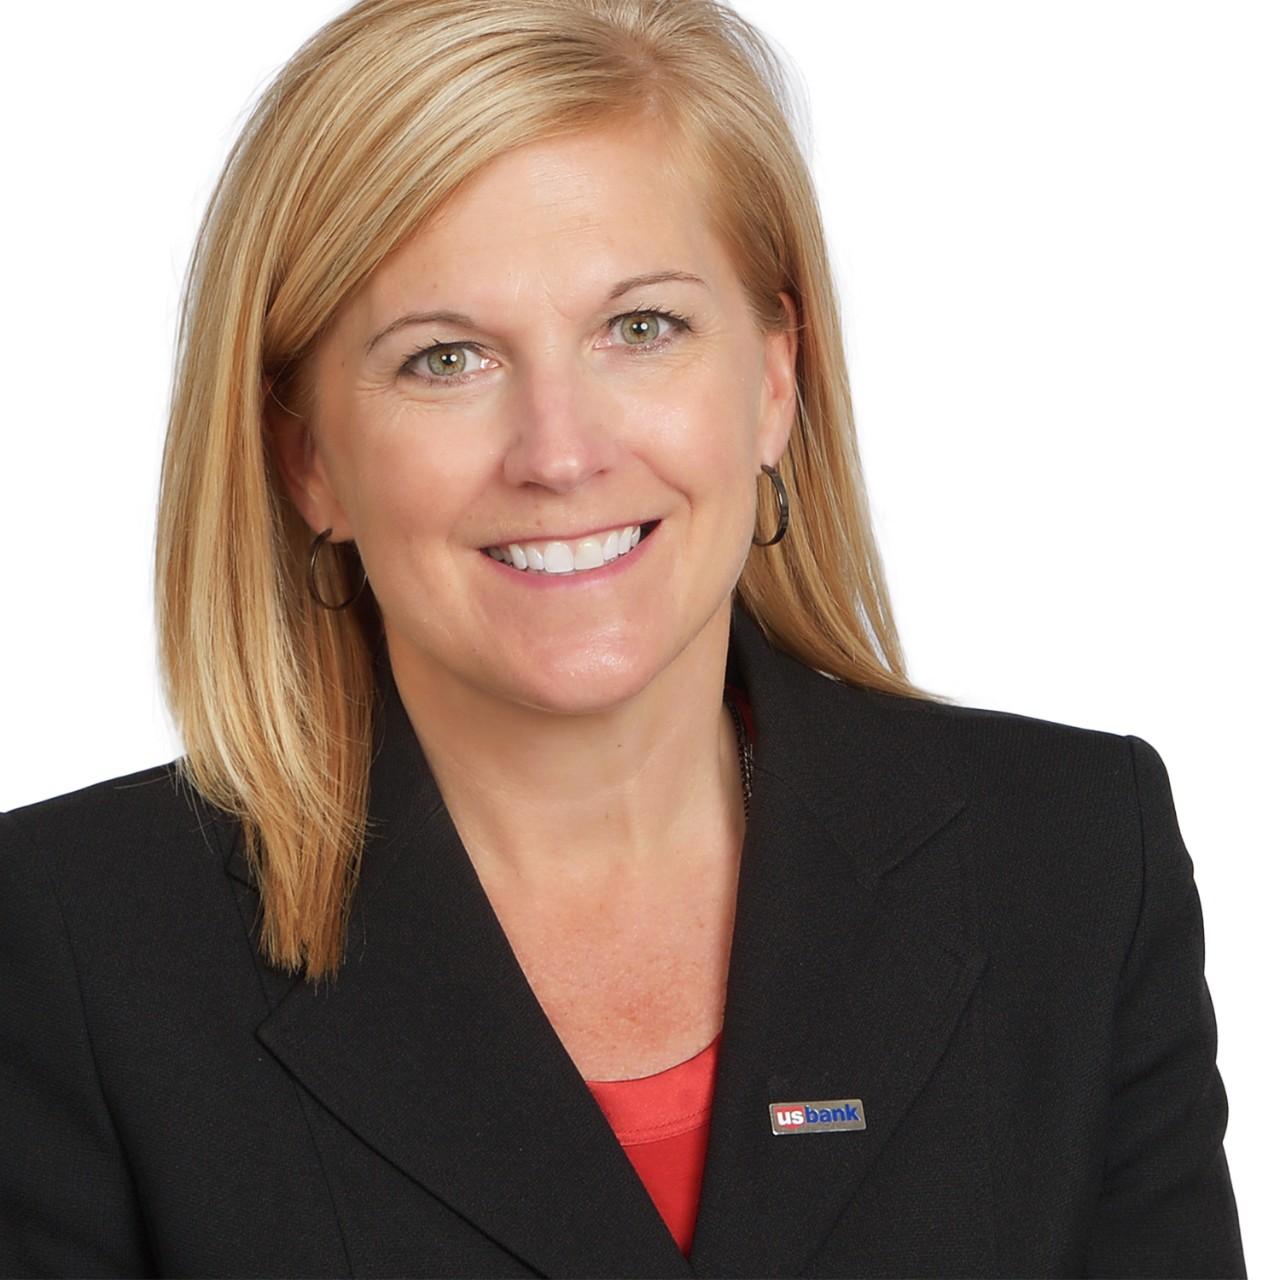 Renda Greene-Fishman   Private Banker   Iowa City, IA   U.S. Bancorp Wealth Management